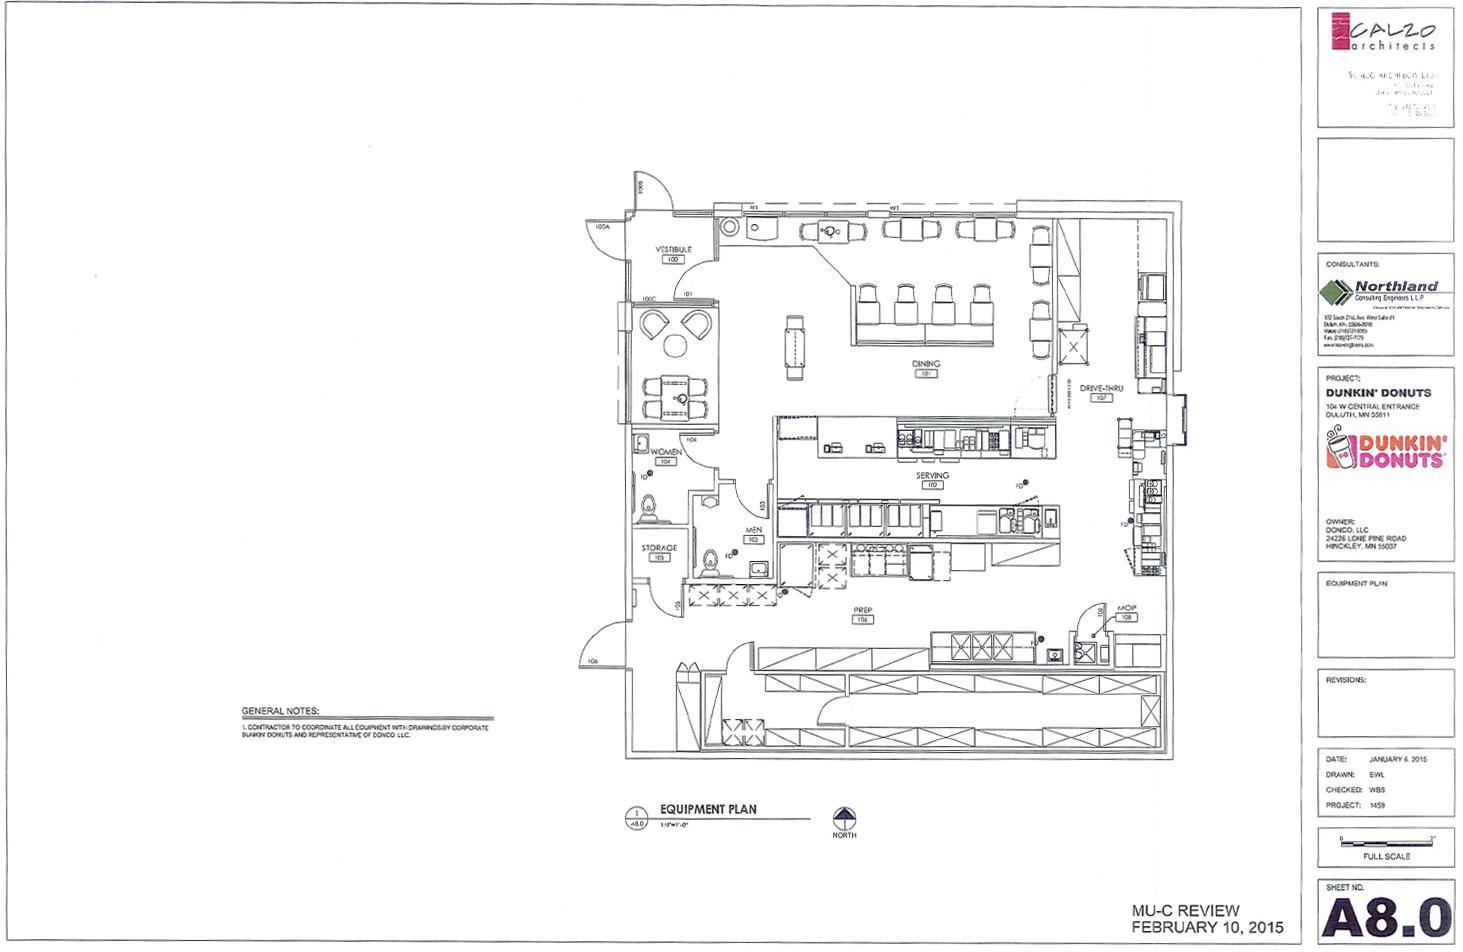 Floor plan of the newDunkin' Donuts location